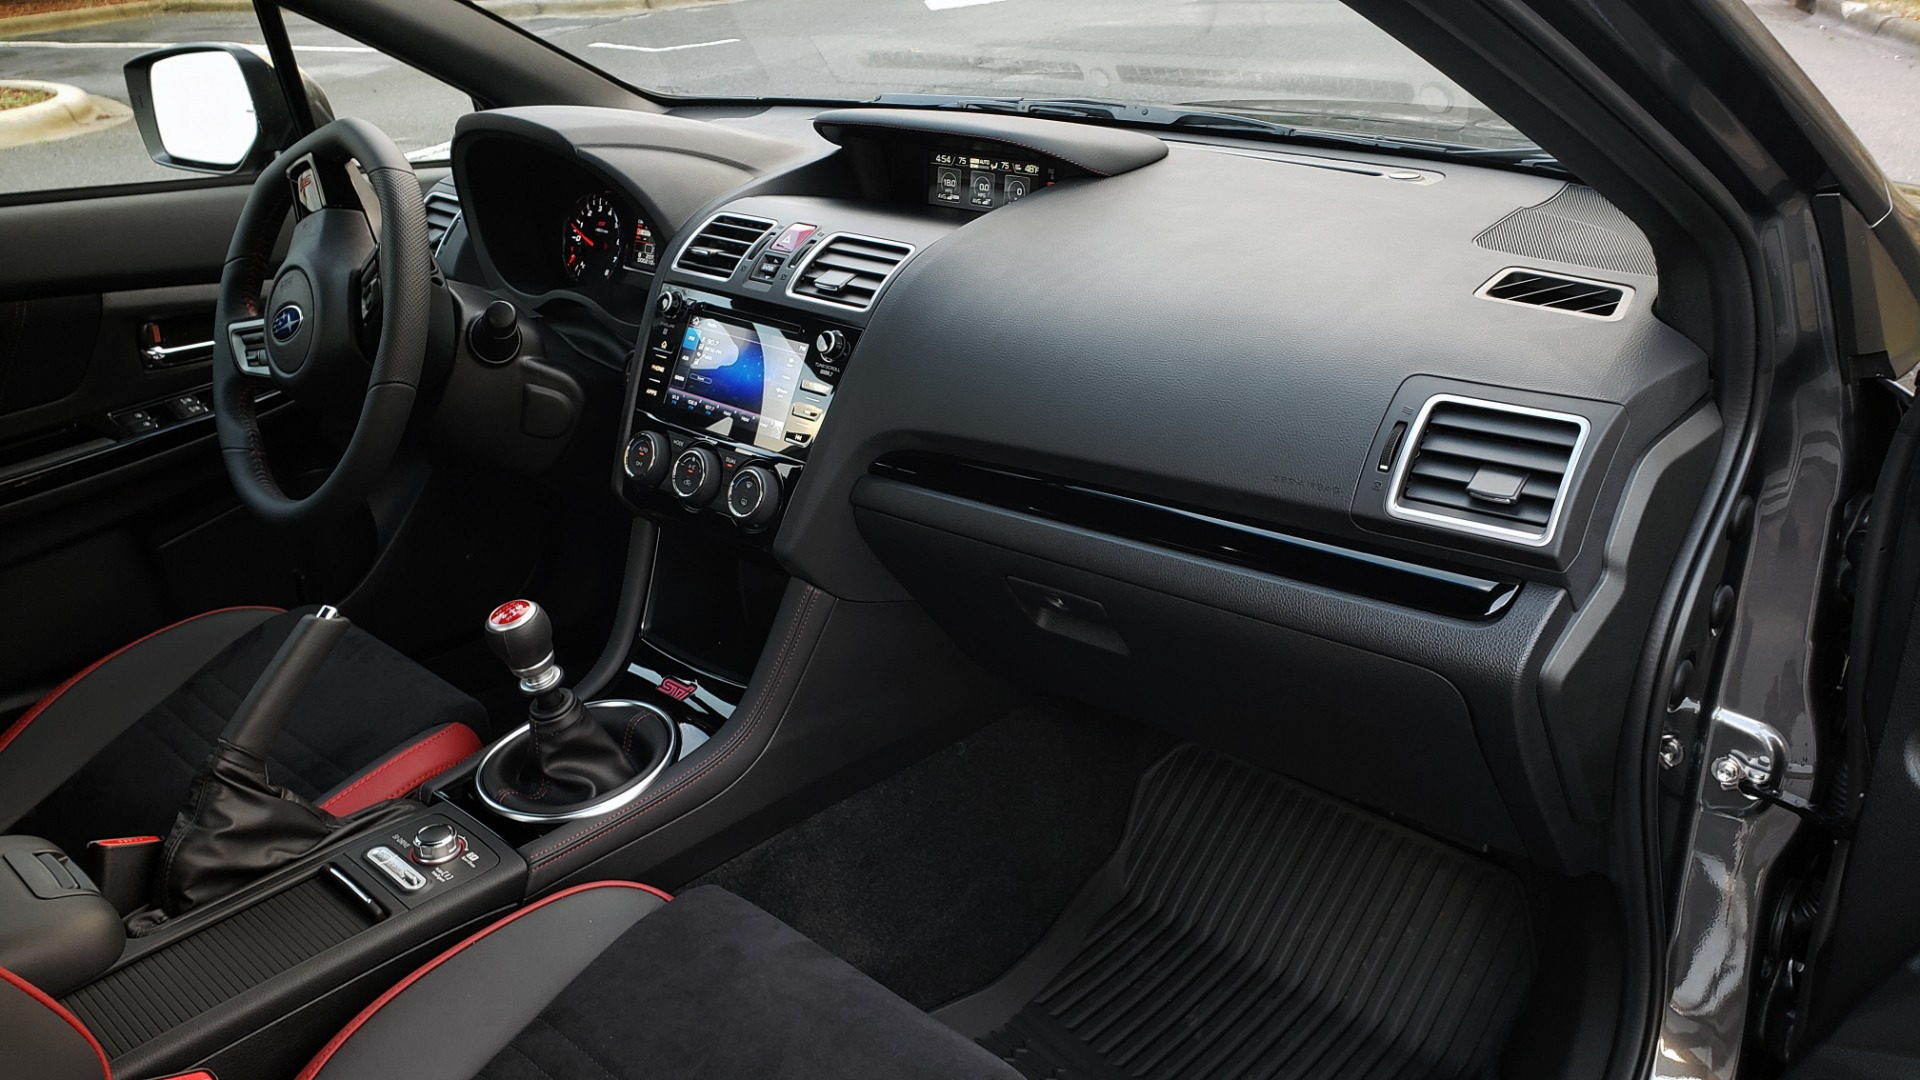 Used 2020 Subaru WRX STI 2.5L TURBO / 6-SPEED MANUAL / RECARO SEATS / REARVIEW for sale Sold at Formula Imports in Charlotte NC 28227 78